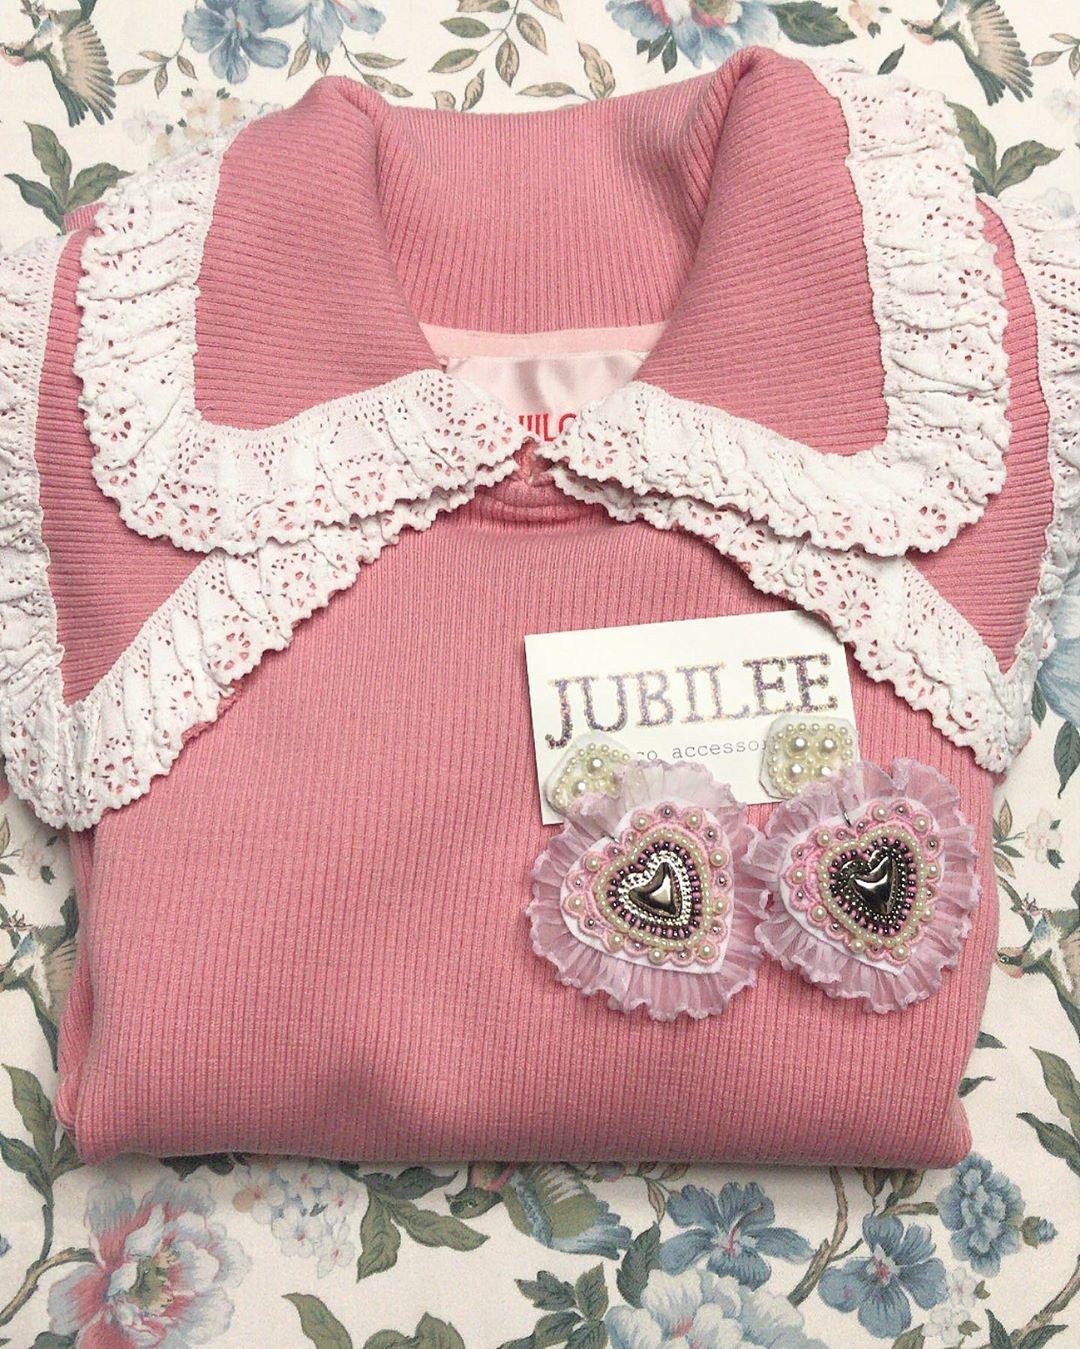 JUBILEE|愛すべき女性の反骨心